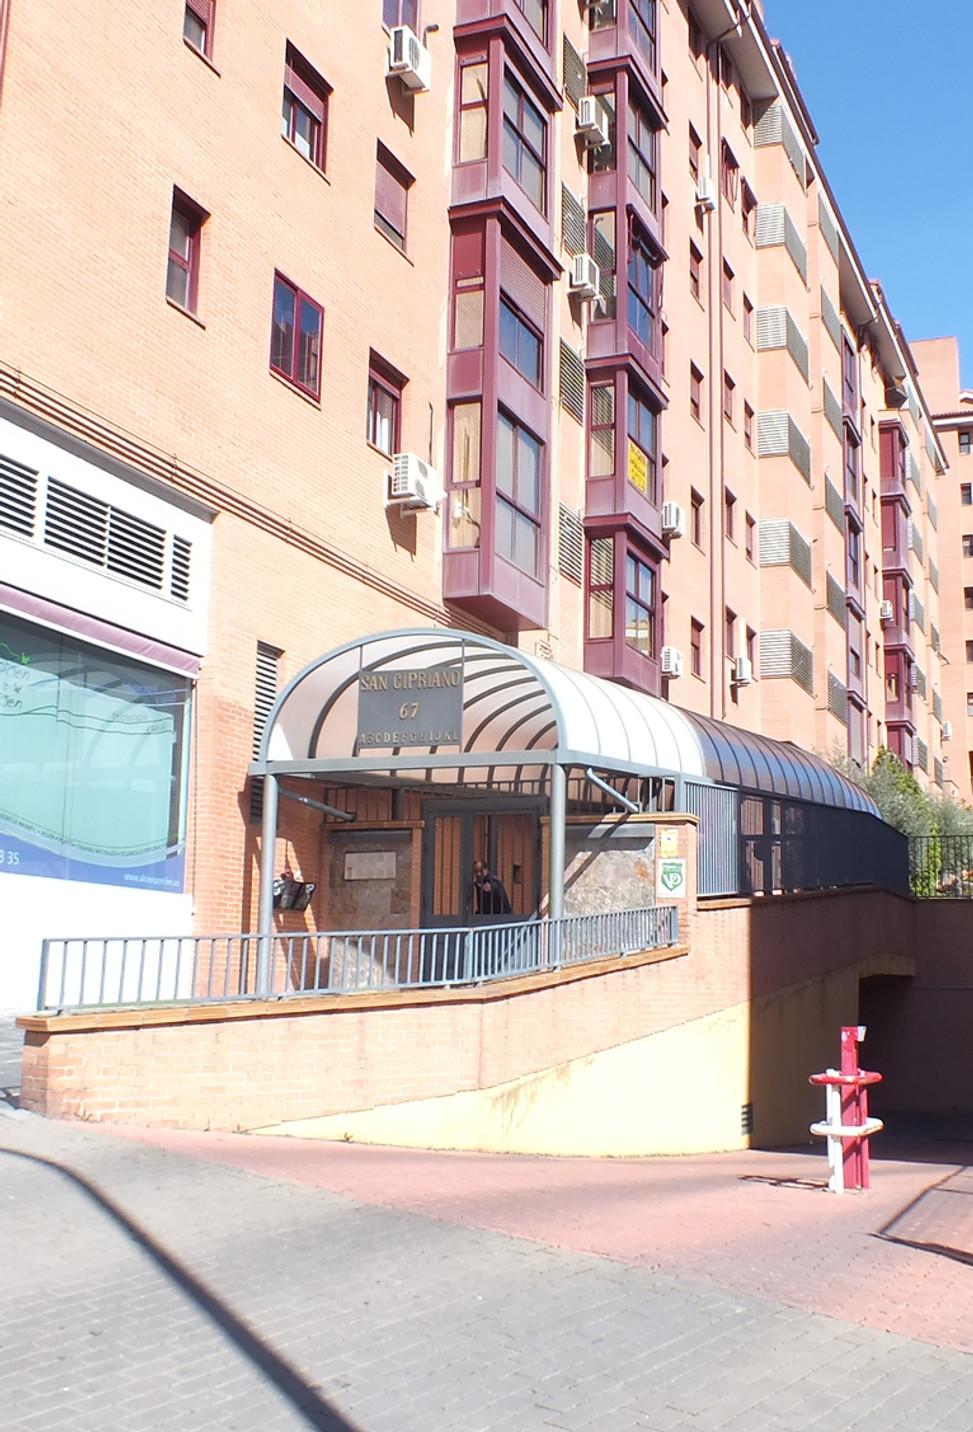 San Cipriano 67 portal I 1º3 (1).JPG